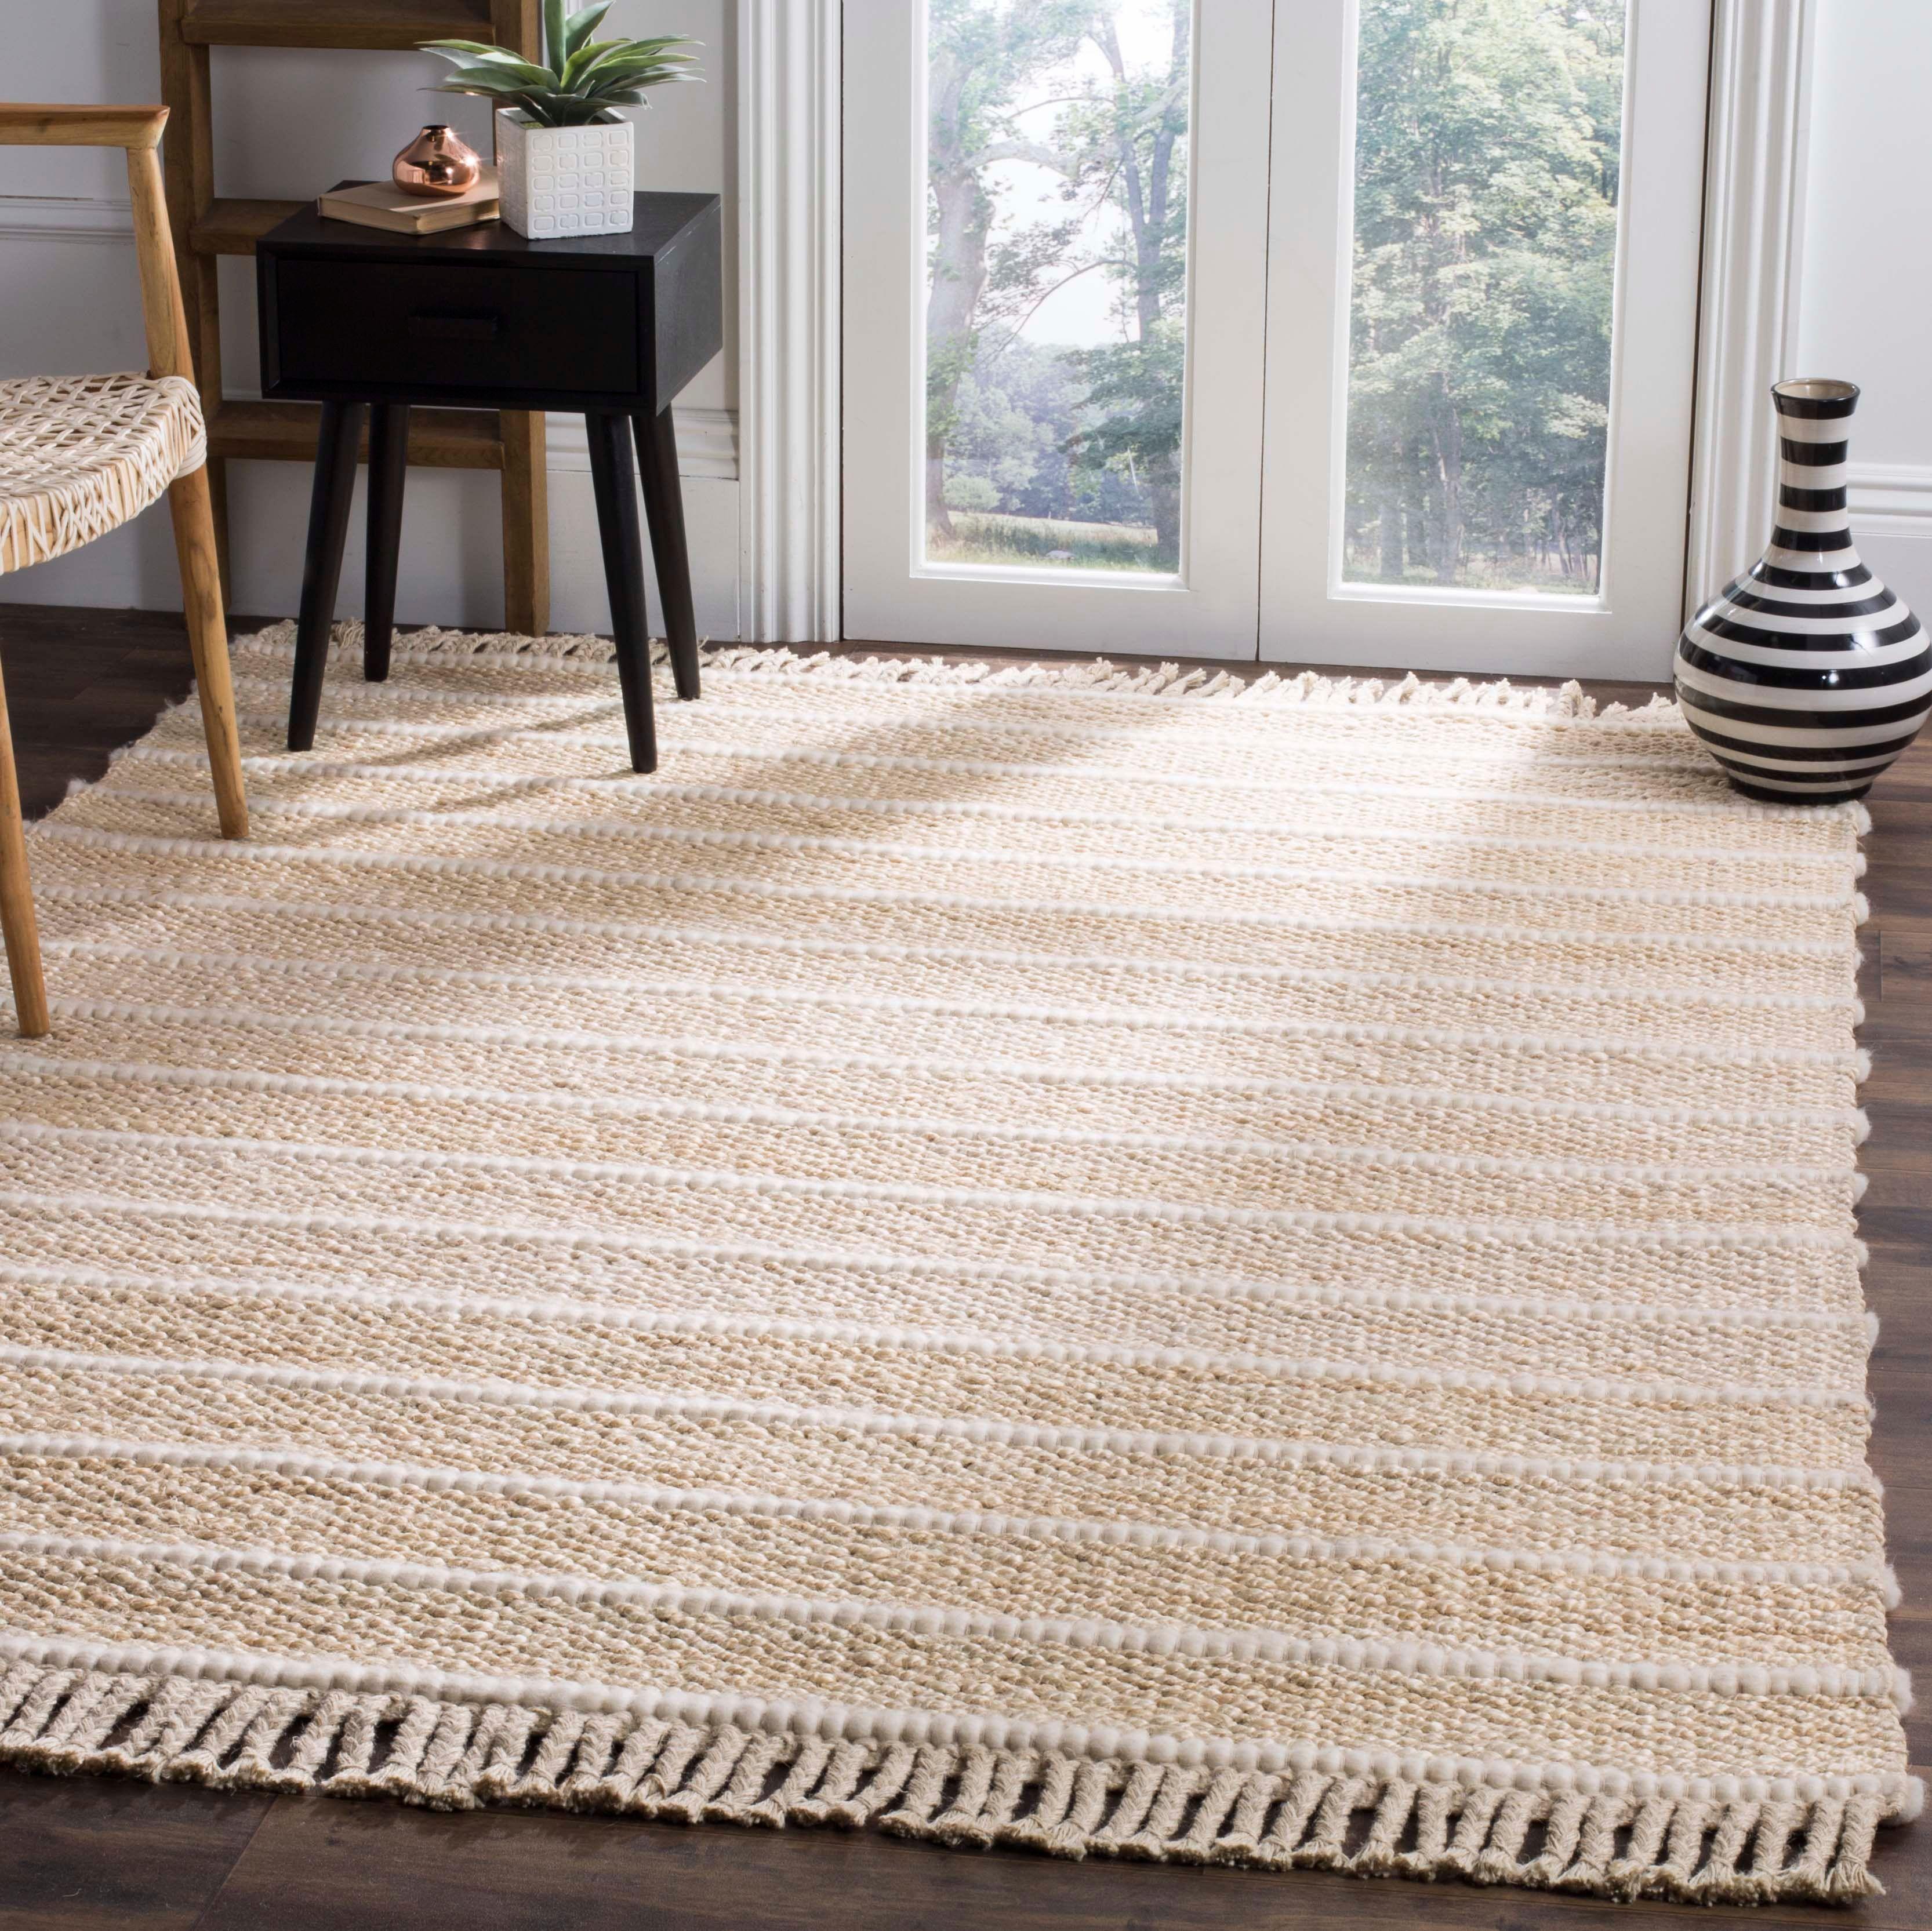 Safavieh Natural Fiber 5 X 8 Area Rug Ivory In 2021 Braided Area Rugs Jute Area Rugs Natural Fiber Rugs Natural fiber rugs that are soft